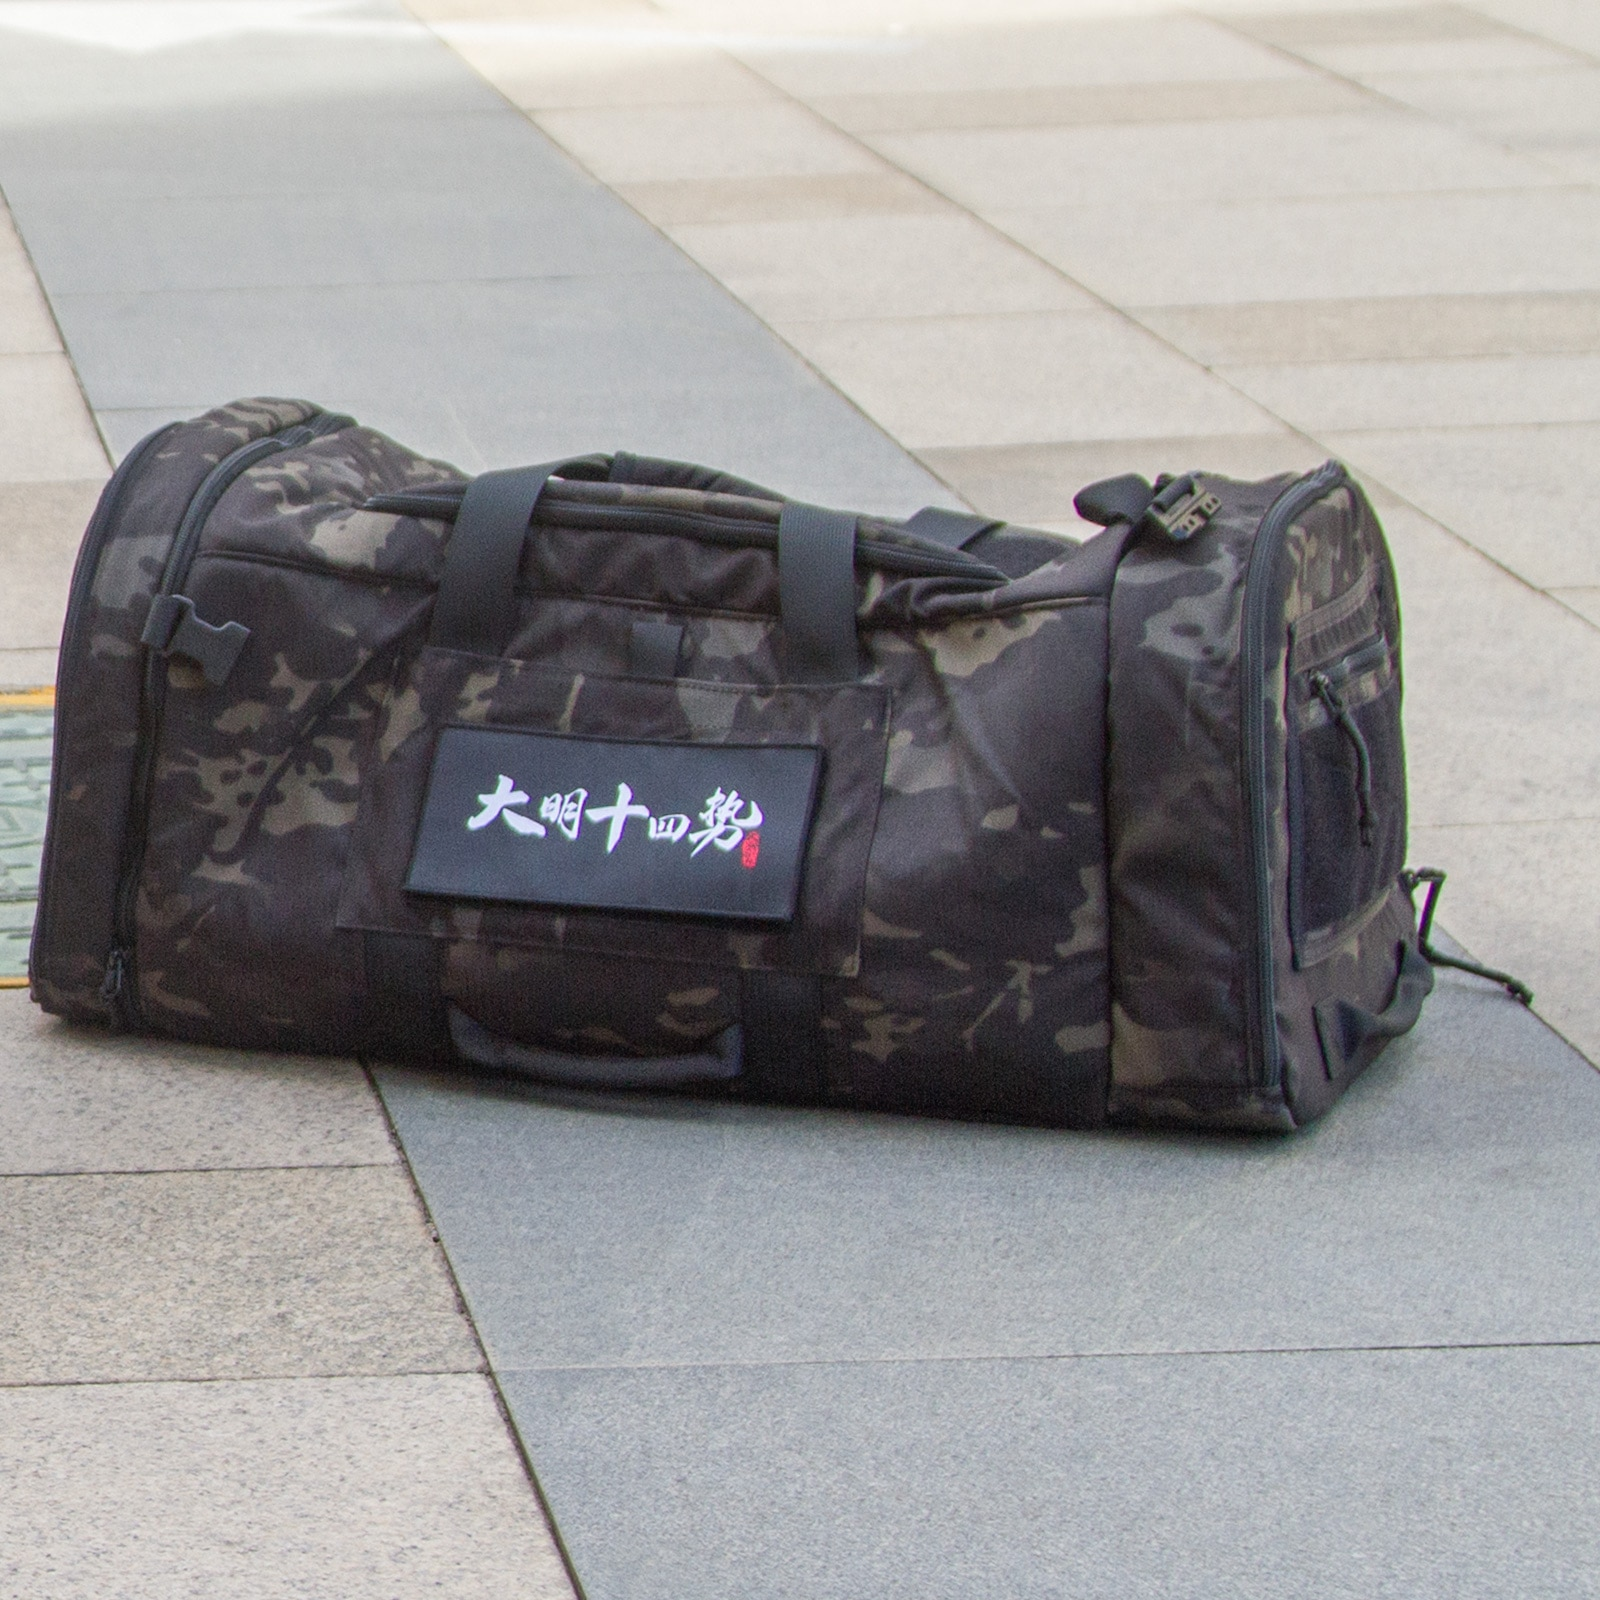 MING-14 Large Capacity Multifunction Equipment Backpack Tactical Shoulder Bag Handbag Outdoors Tactics Accessories - MCBK